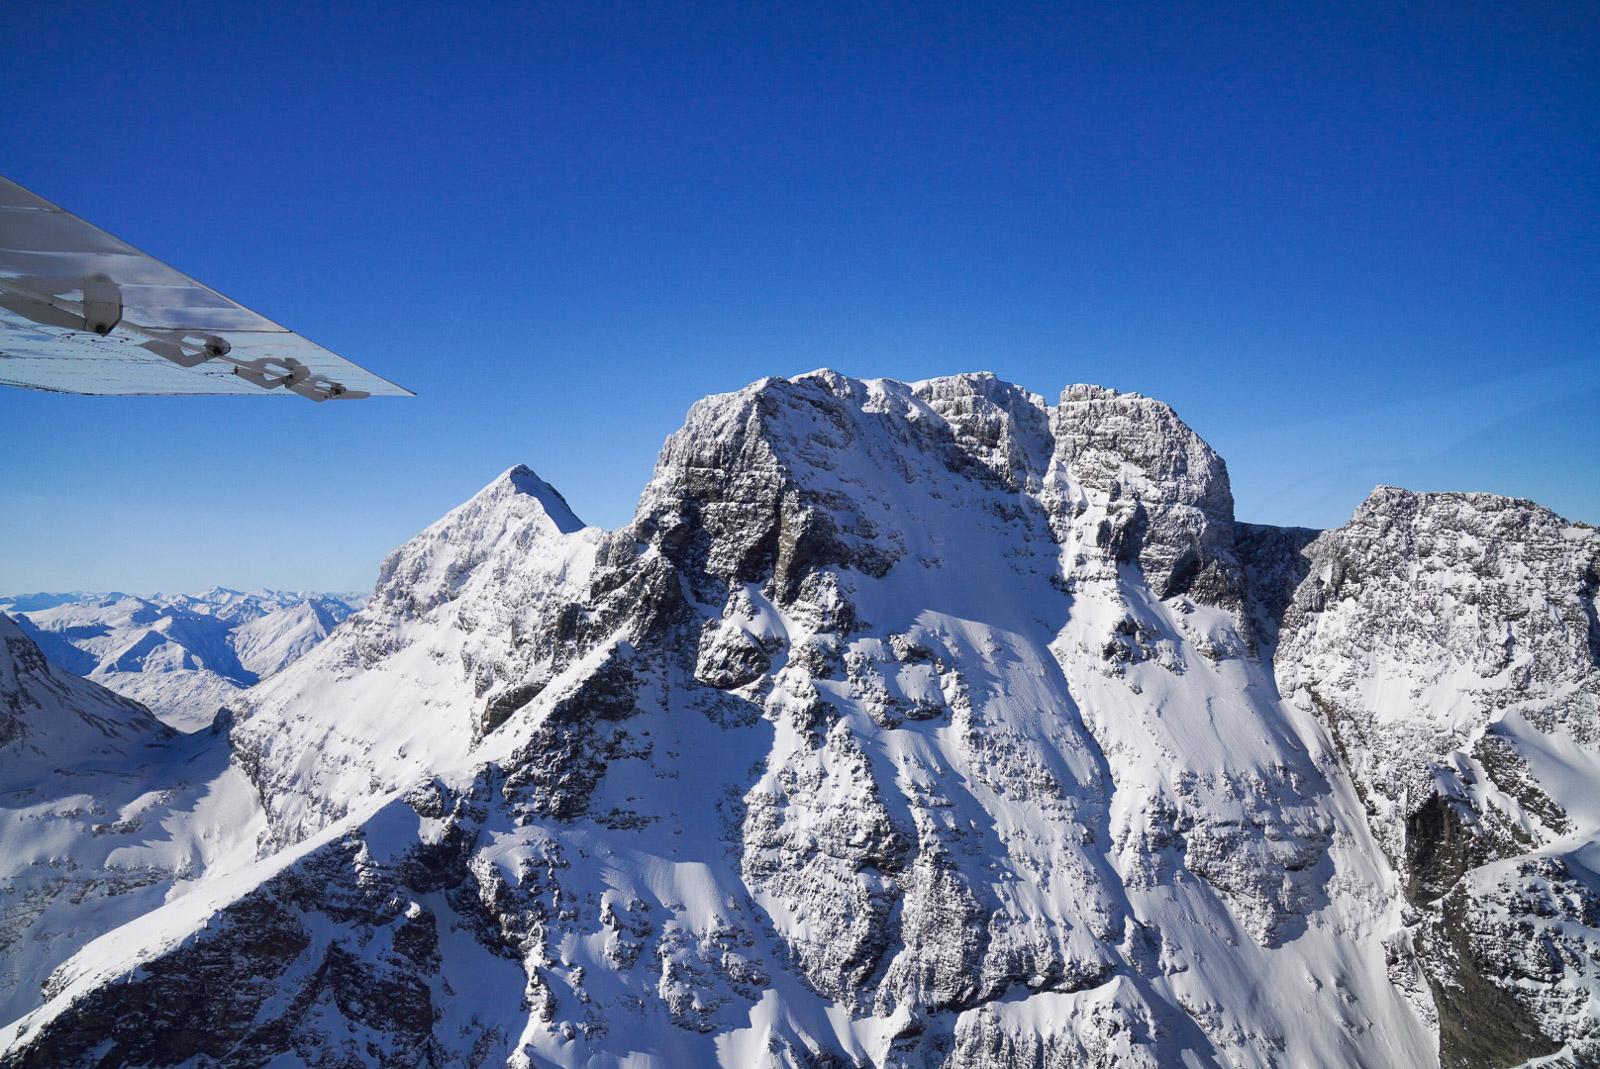 Glenorchy Air Milford Sound Flight at 24mm